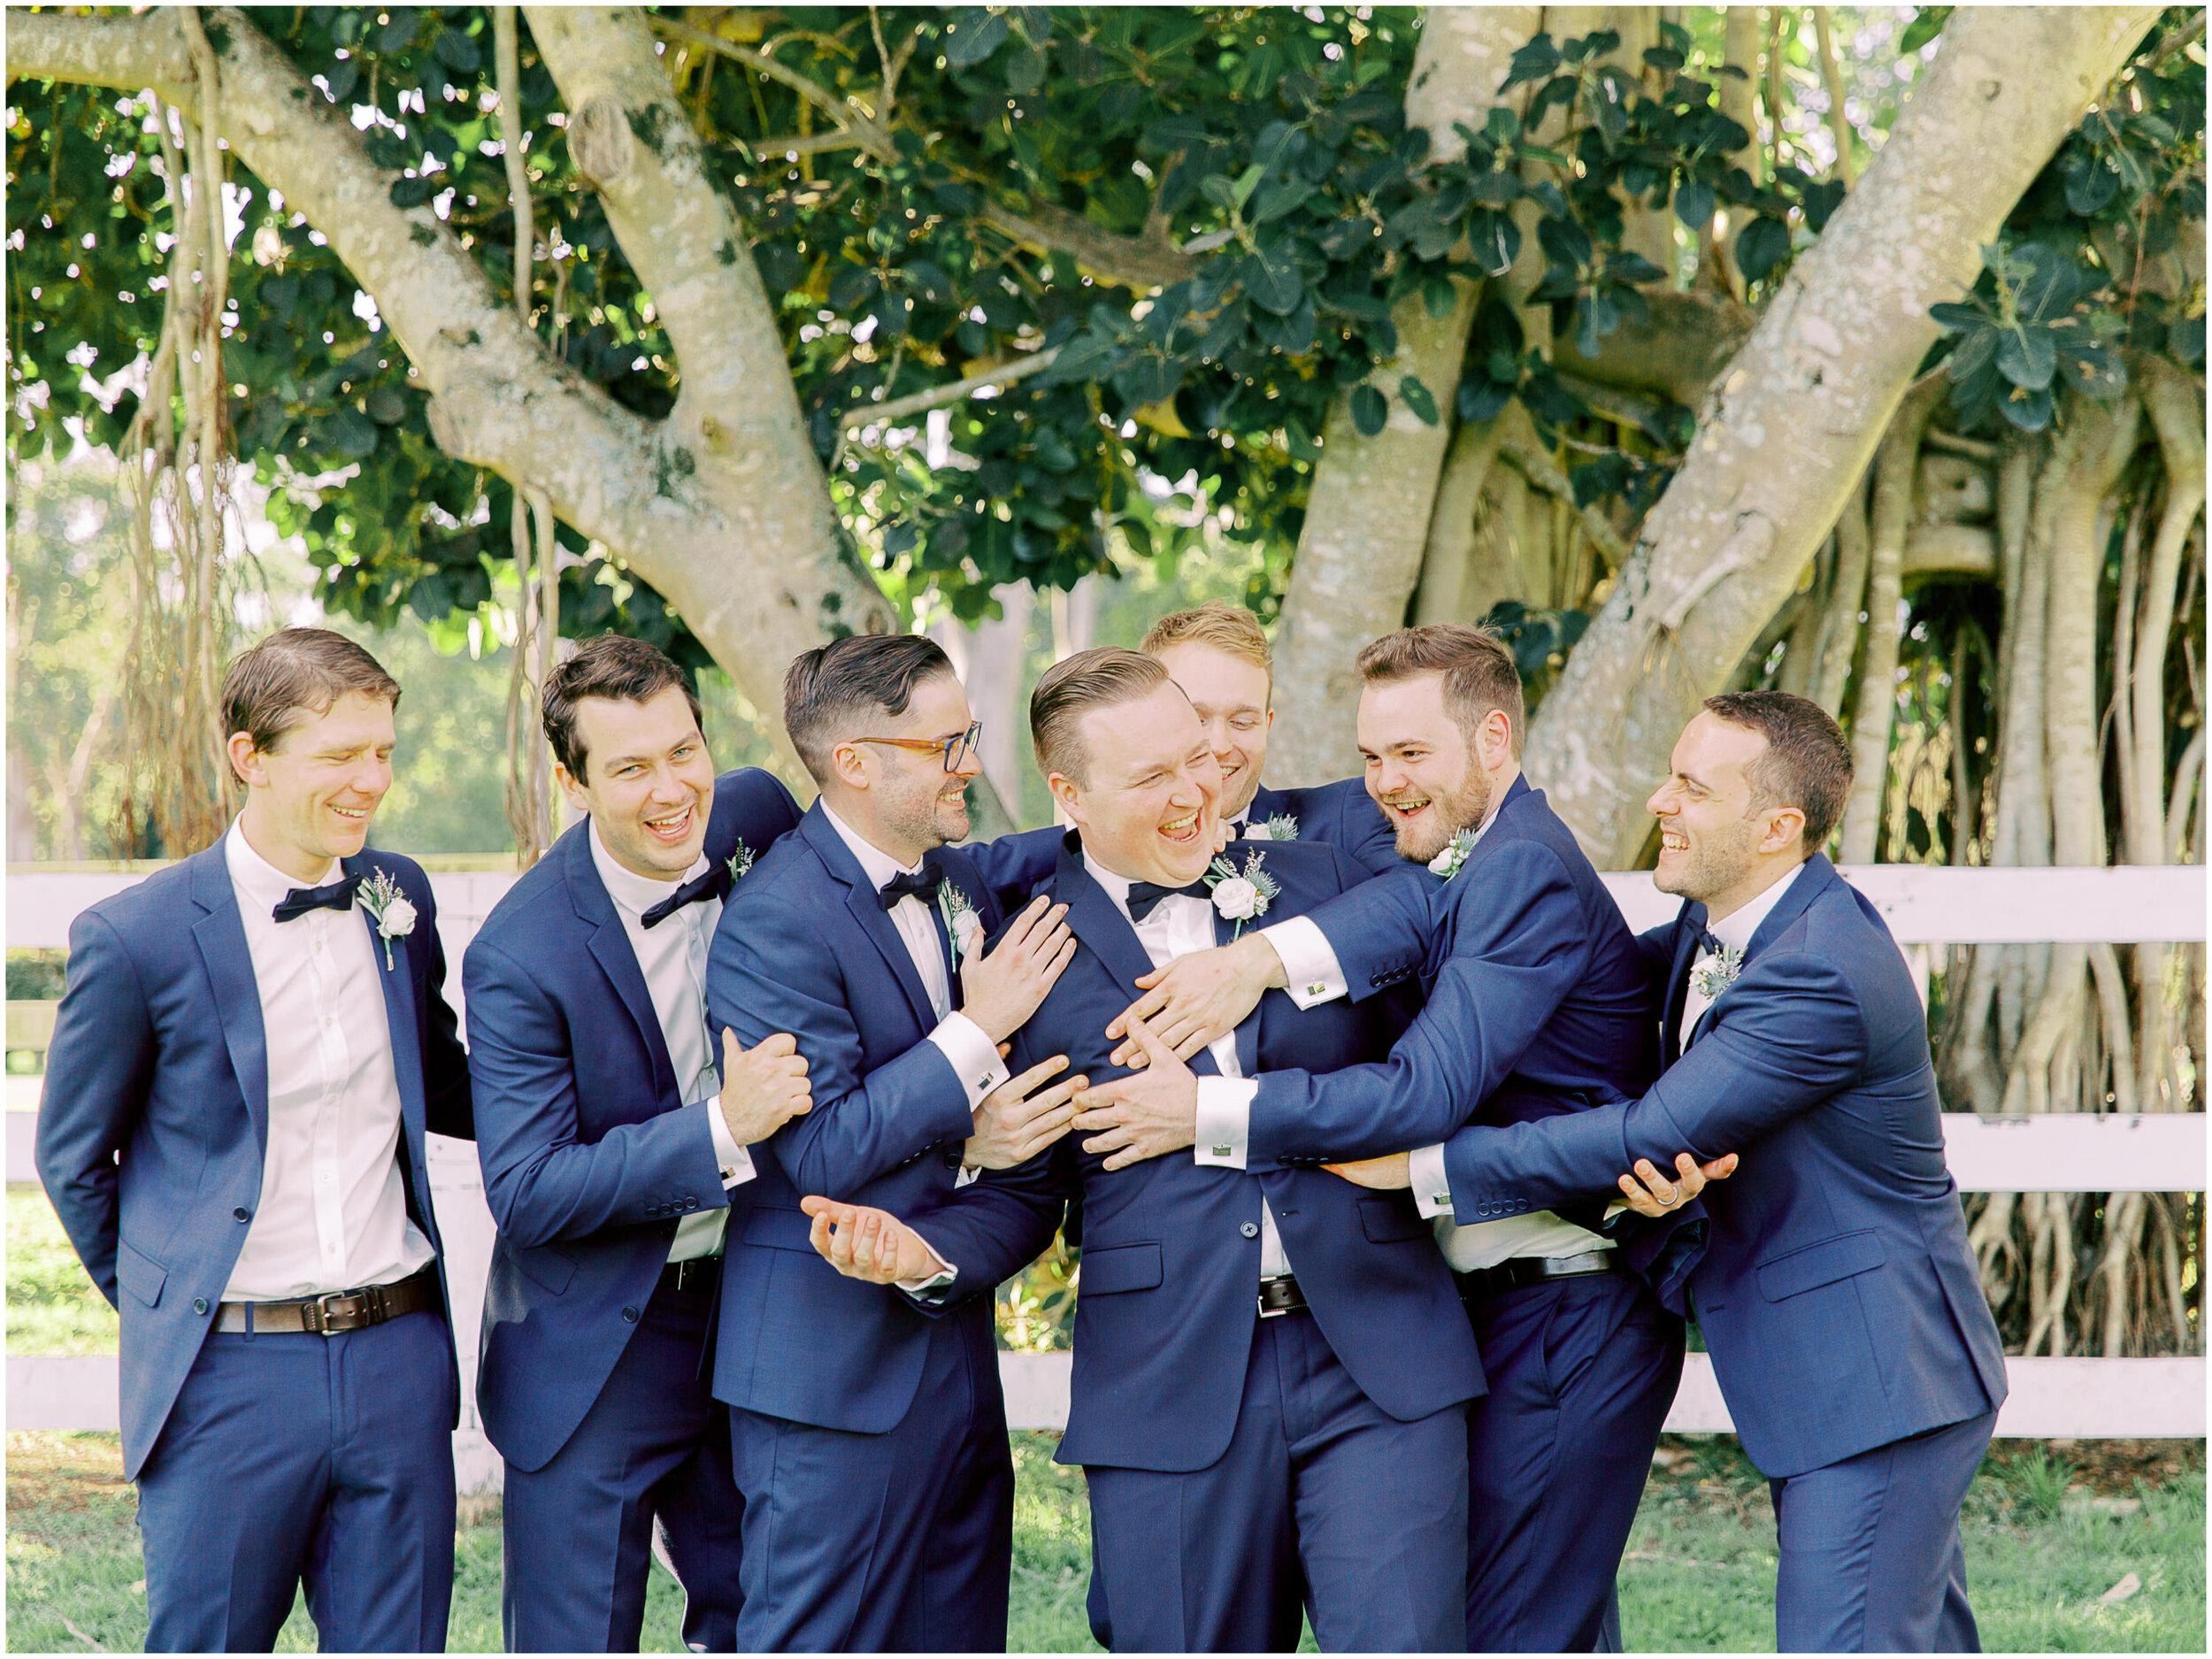 brisbane-film-wedding-photographer-lauren-olivia-luxury-wedding-australia-01-15.jpg